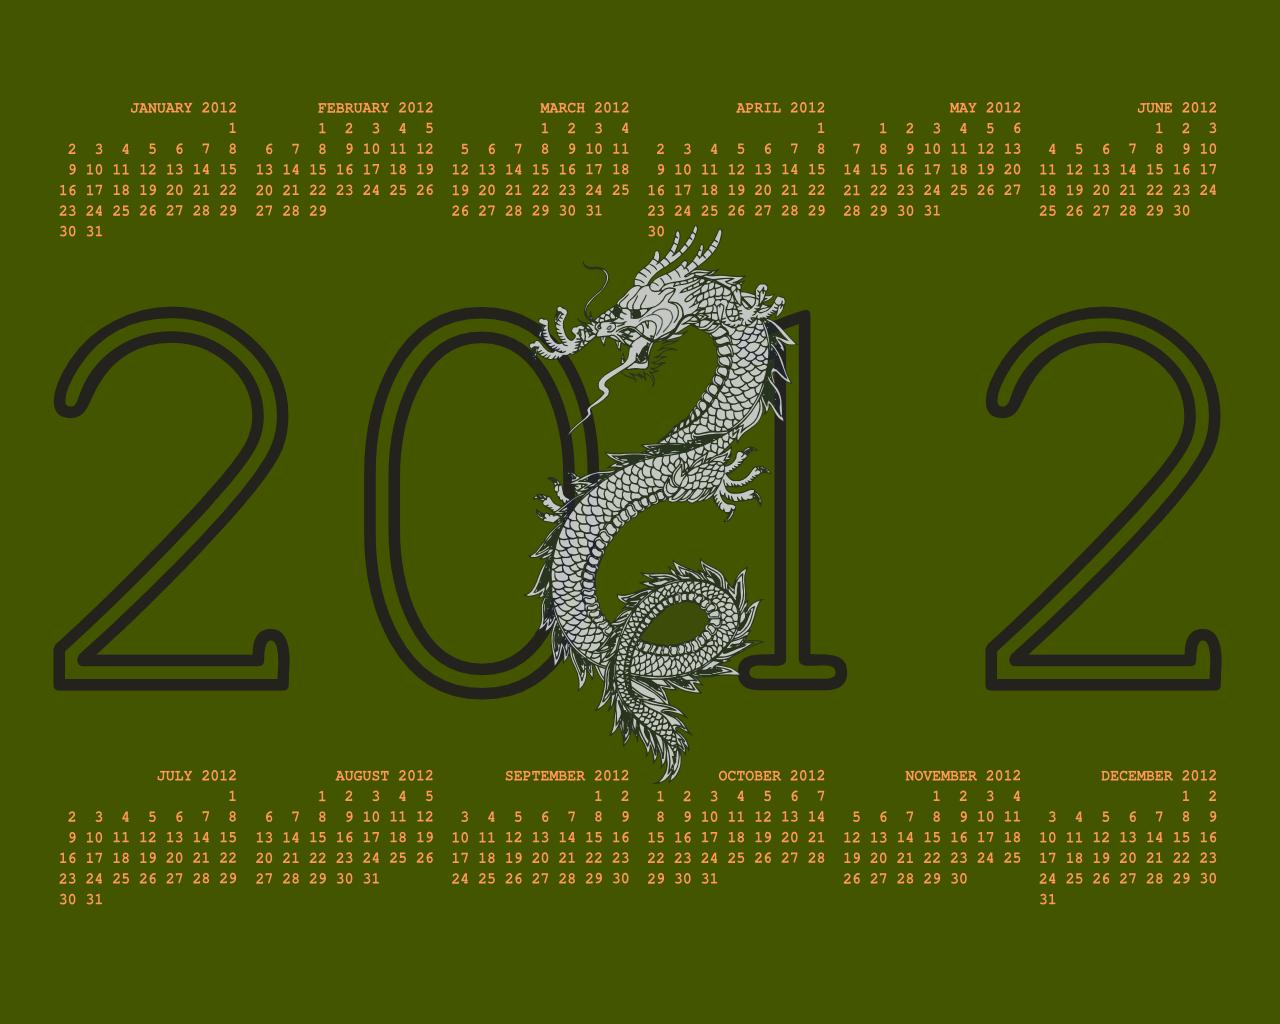 http://2.bp.blogspot.com/-1Be7DlhSXAw/TvyaL3sR71I/AAAAAAAAATY/1i9JEEbnFFg/s1600/desktop-wallpaper+calender.png